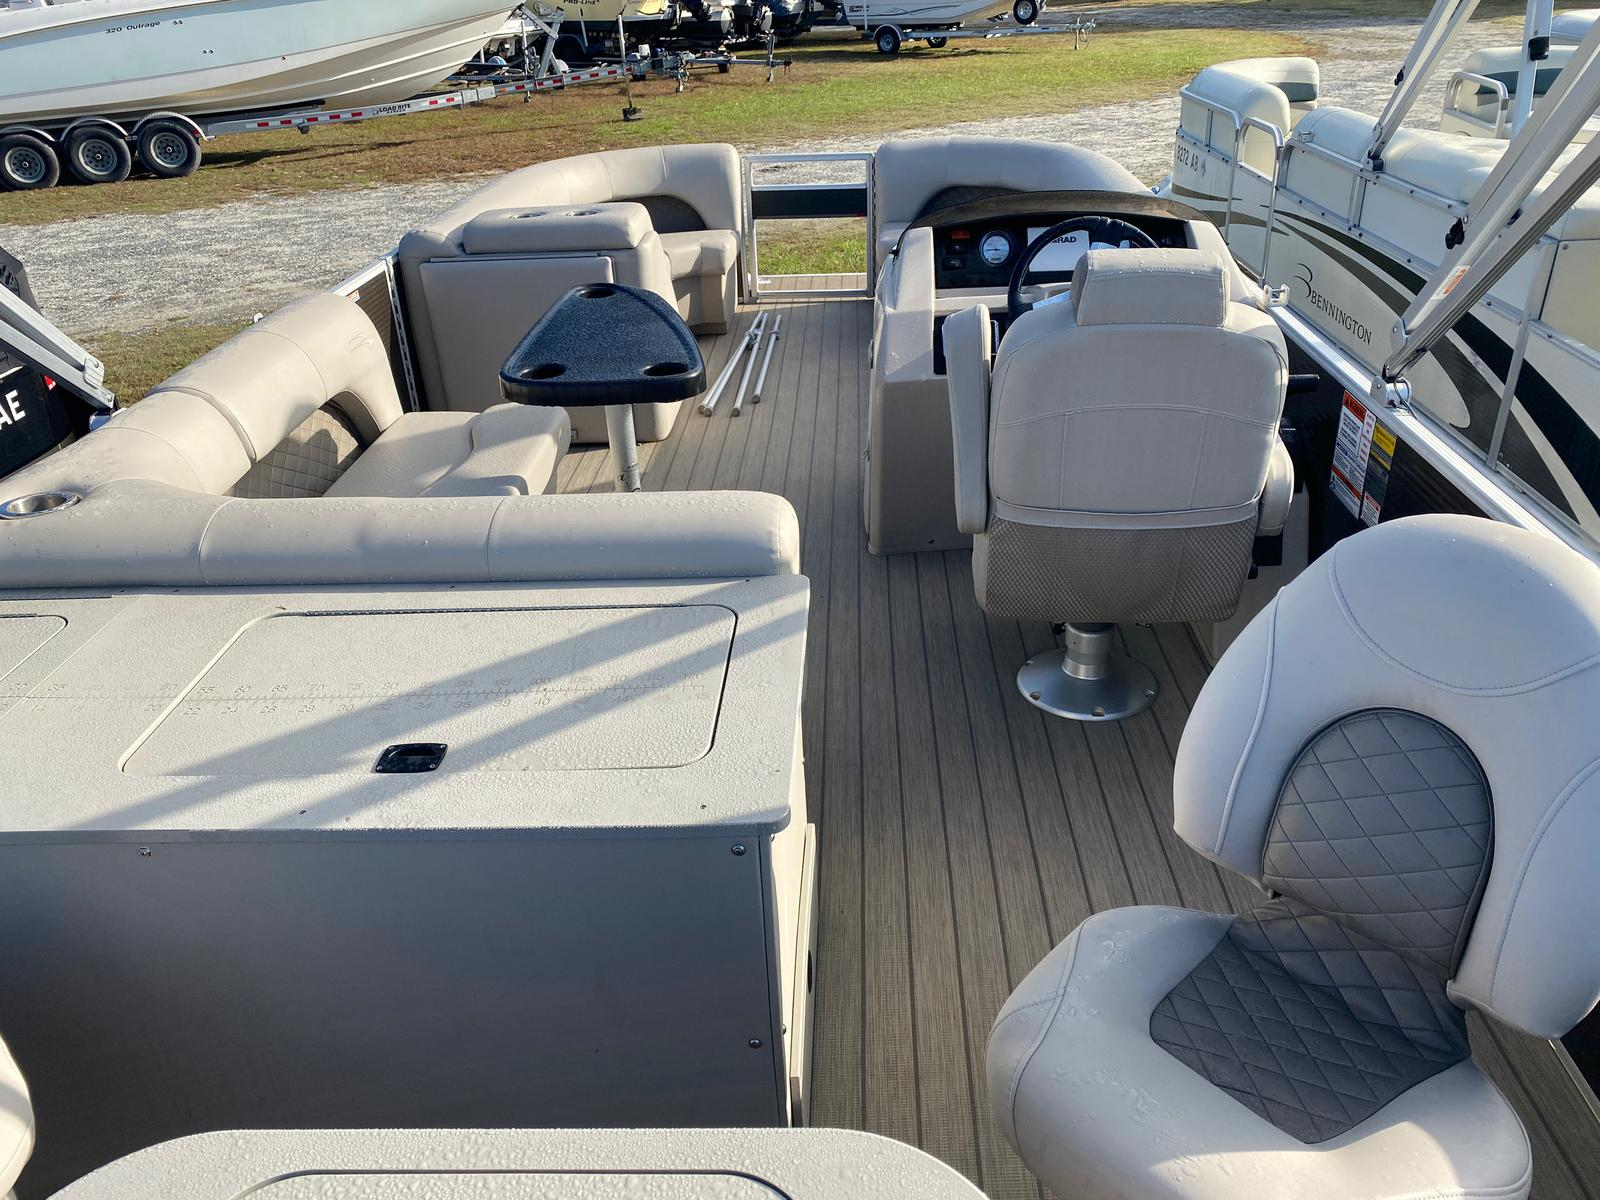 2018 Bennington boat for sale, model of the boat is 22 SSX Pontoon & Image # 4 of 13